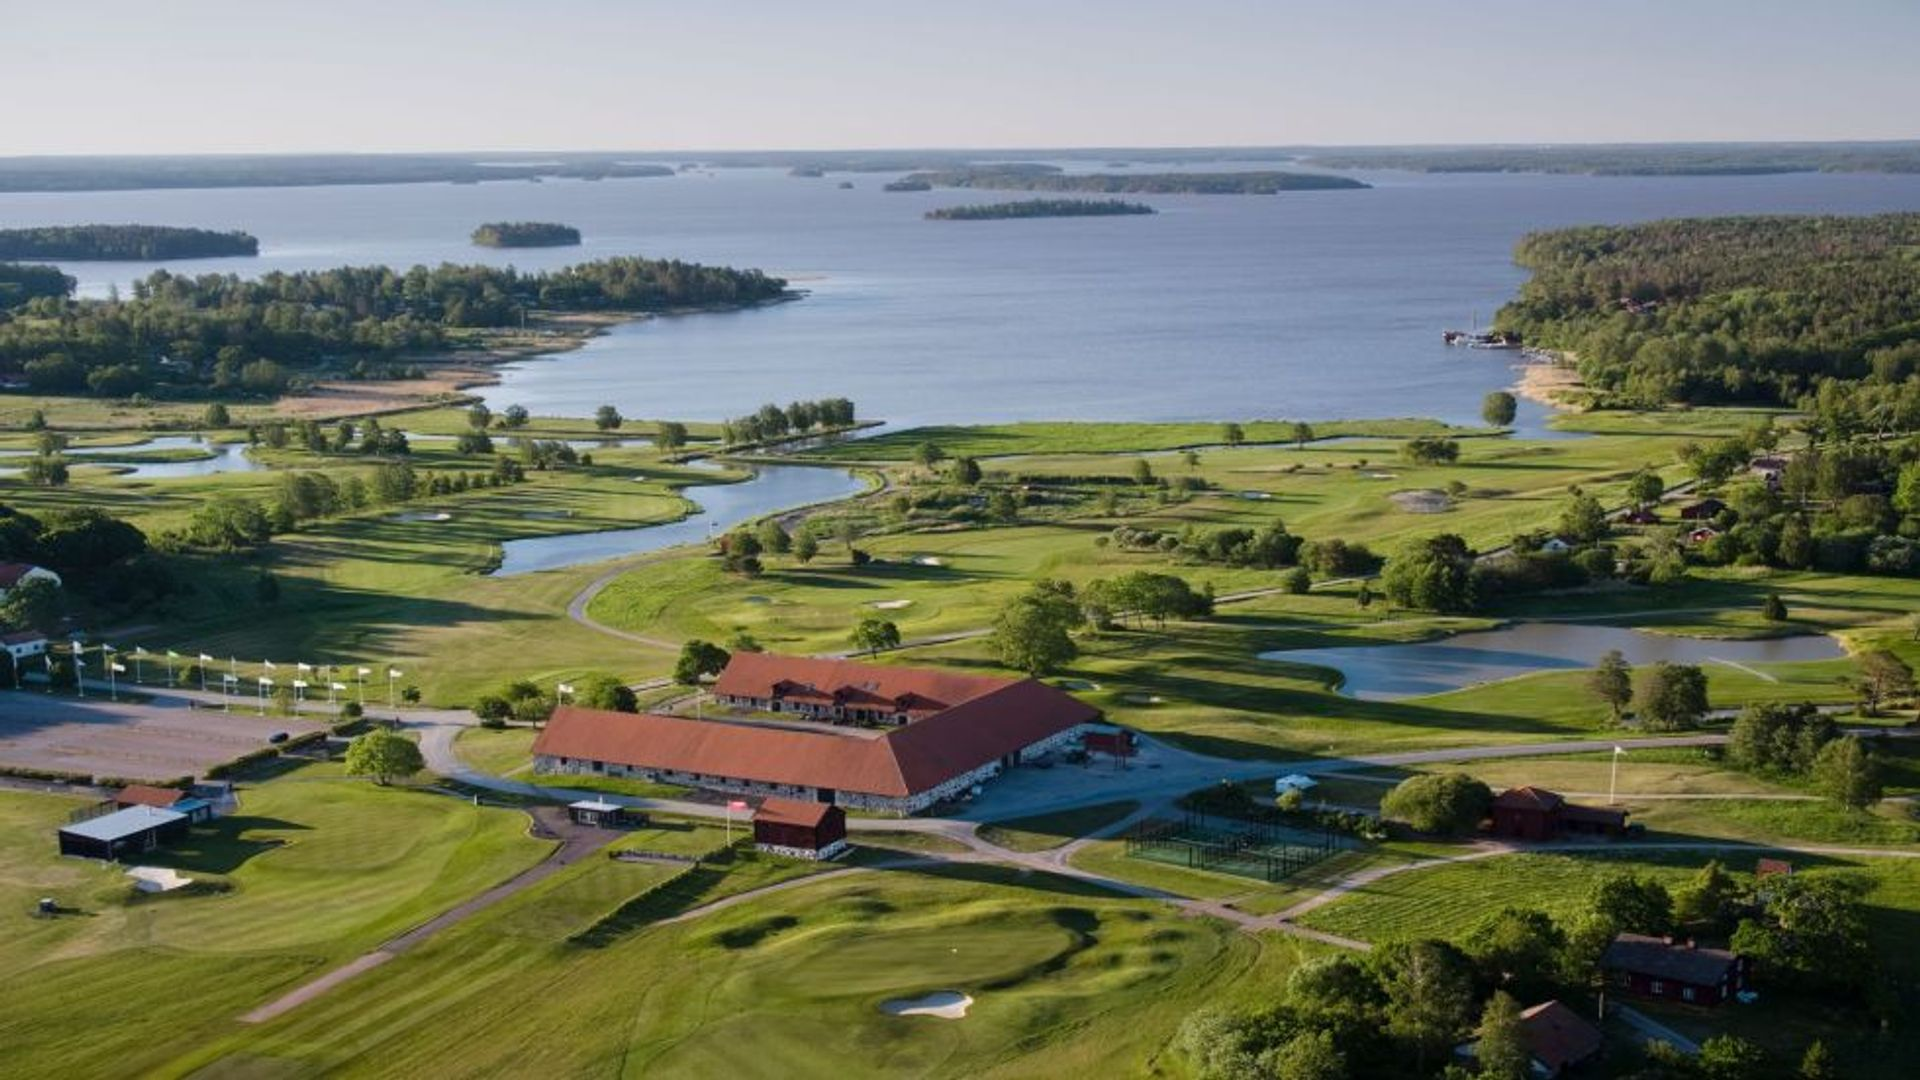 Vybild över Frösåker golfklubb. Fotograf: Pressbild